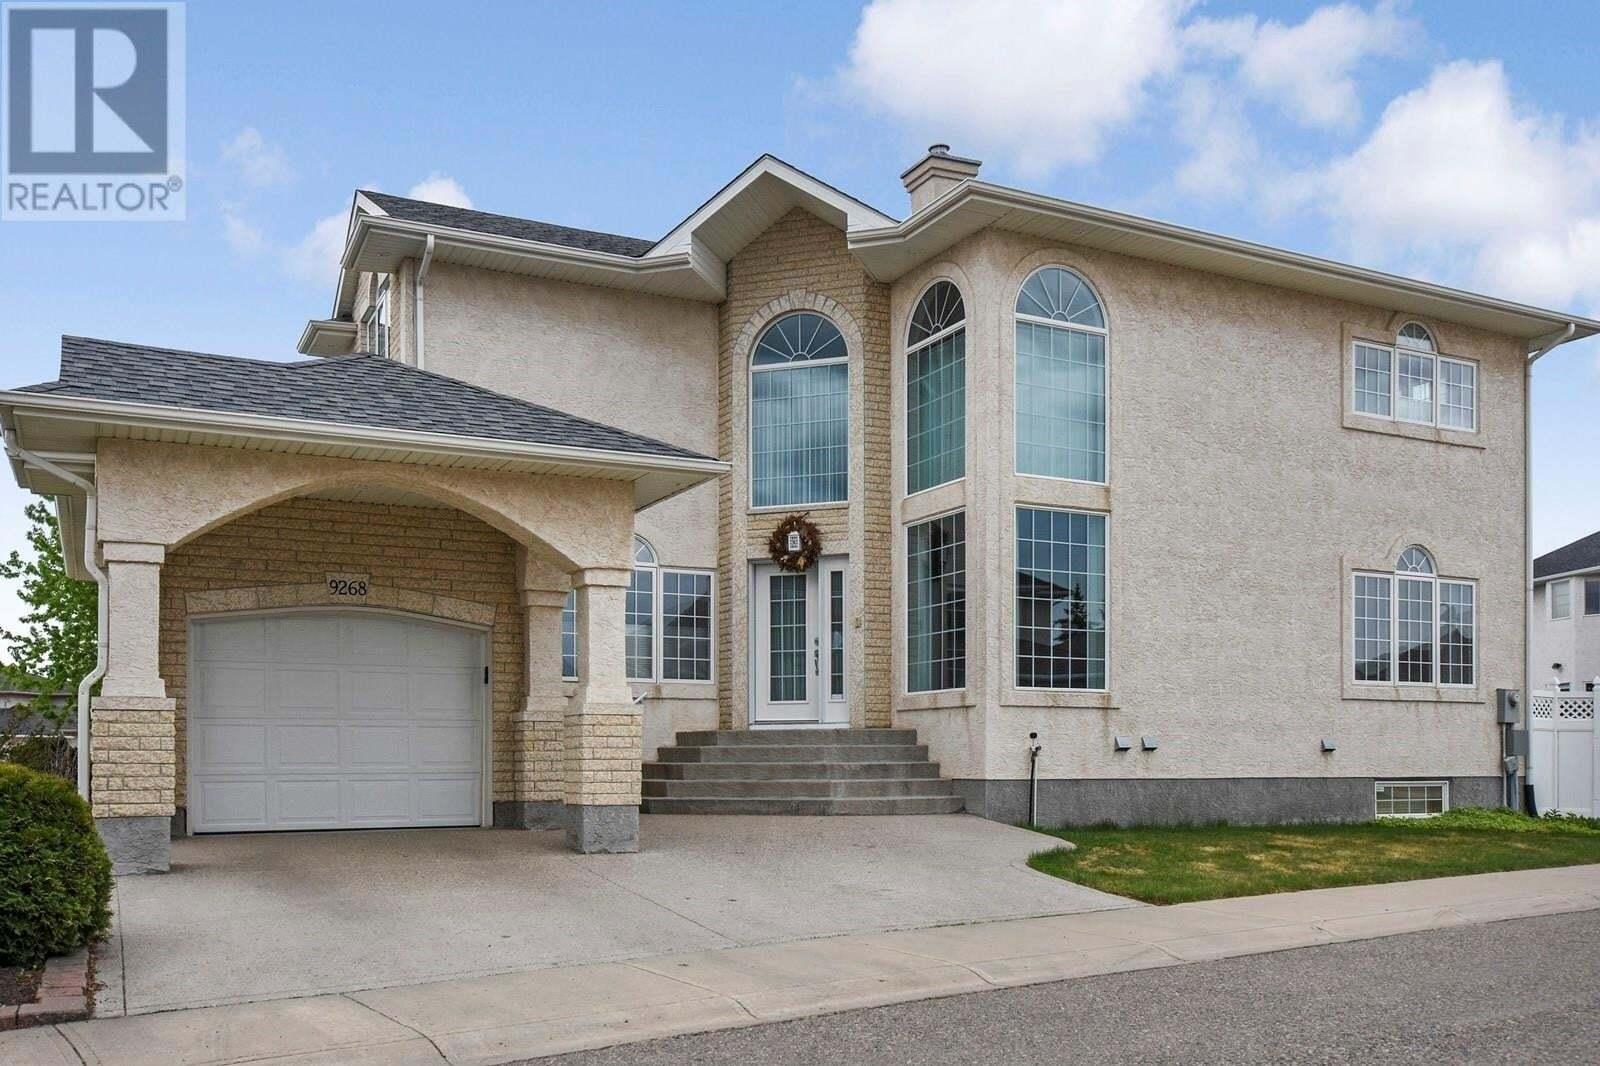 House for sale at 9268 Wascana Me Regina Saskatchewan - MLS: SK809817